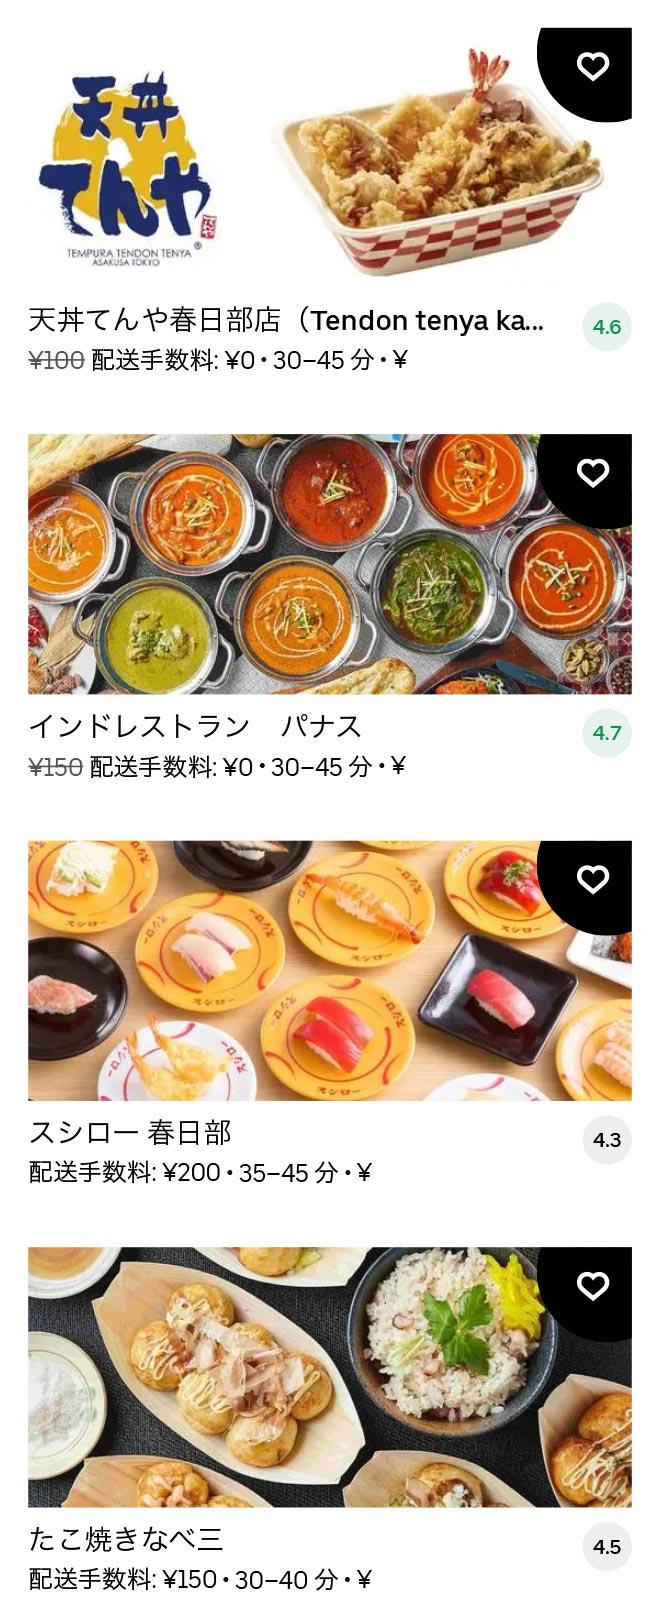 Kasukabe menu 2101 02